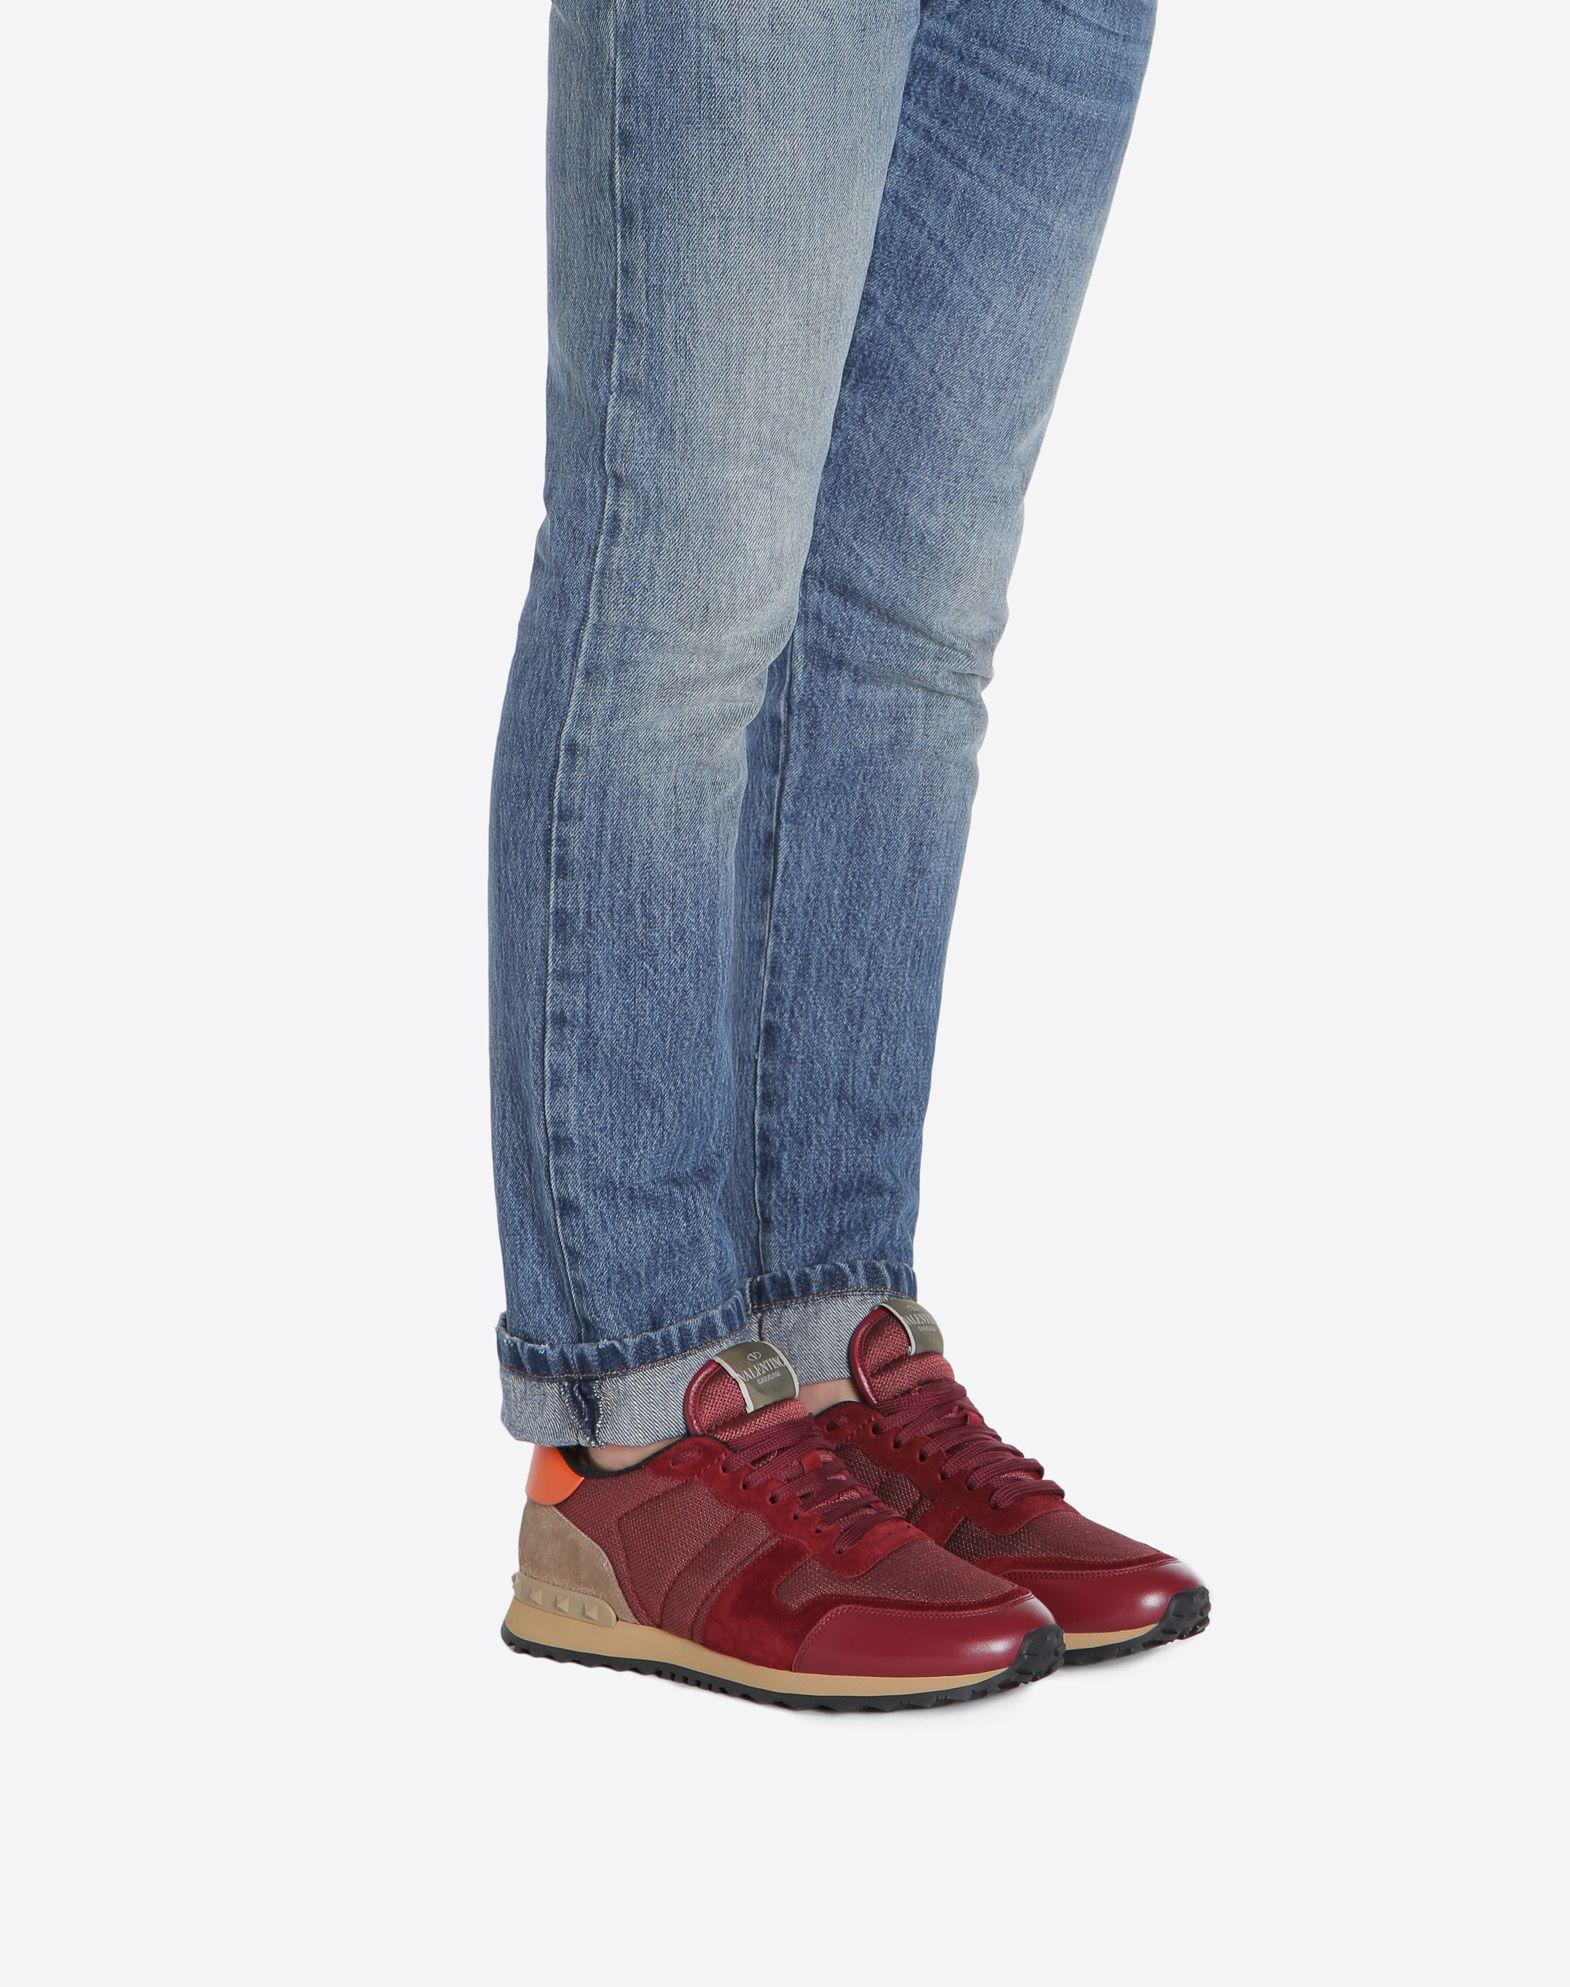 VALENTINO GARAVANI UOMO Rockrunner Sneaker LOW-TOP SNEAKERS U a